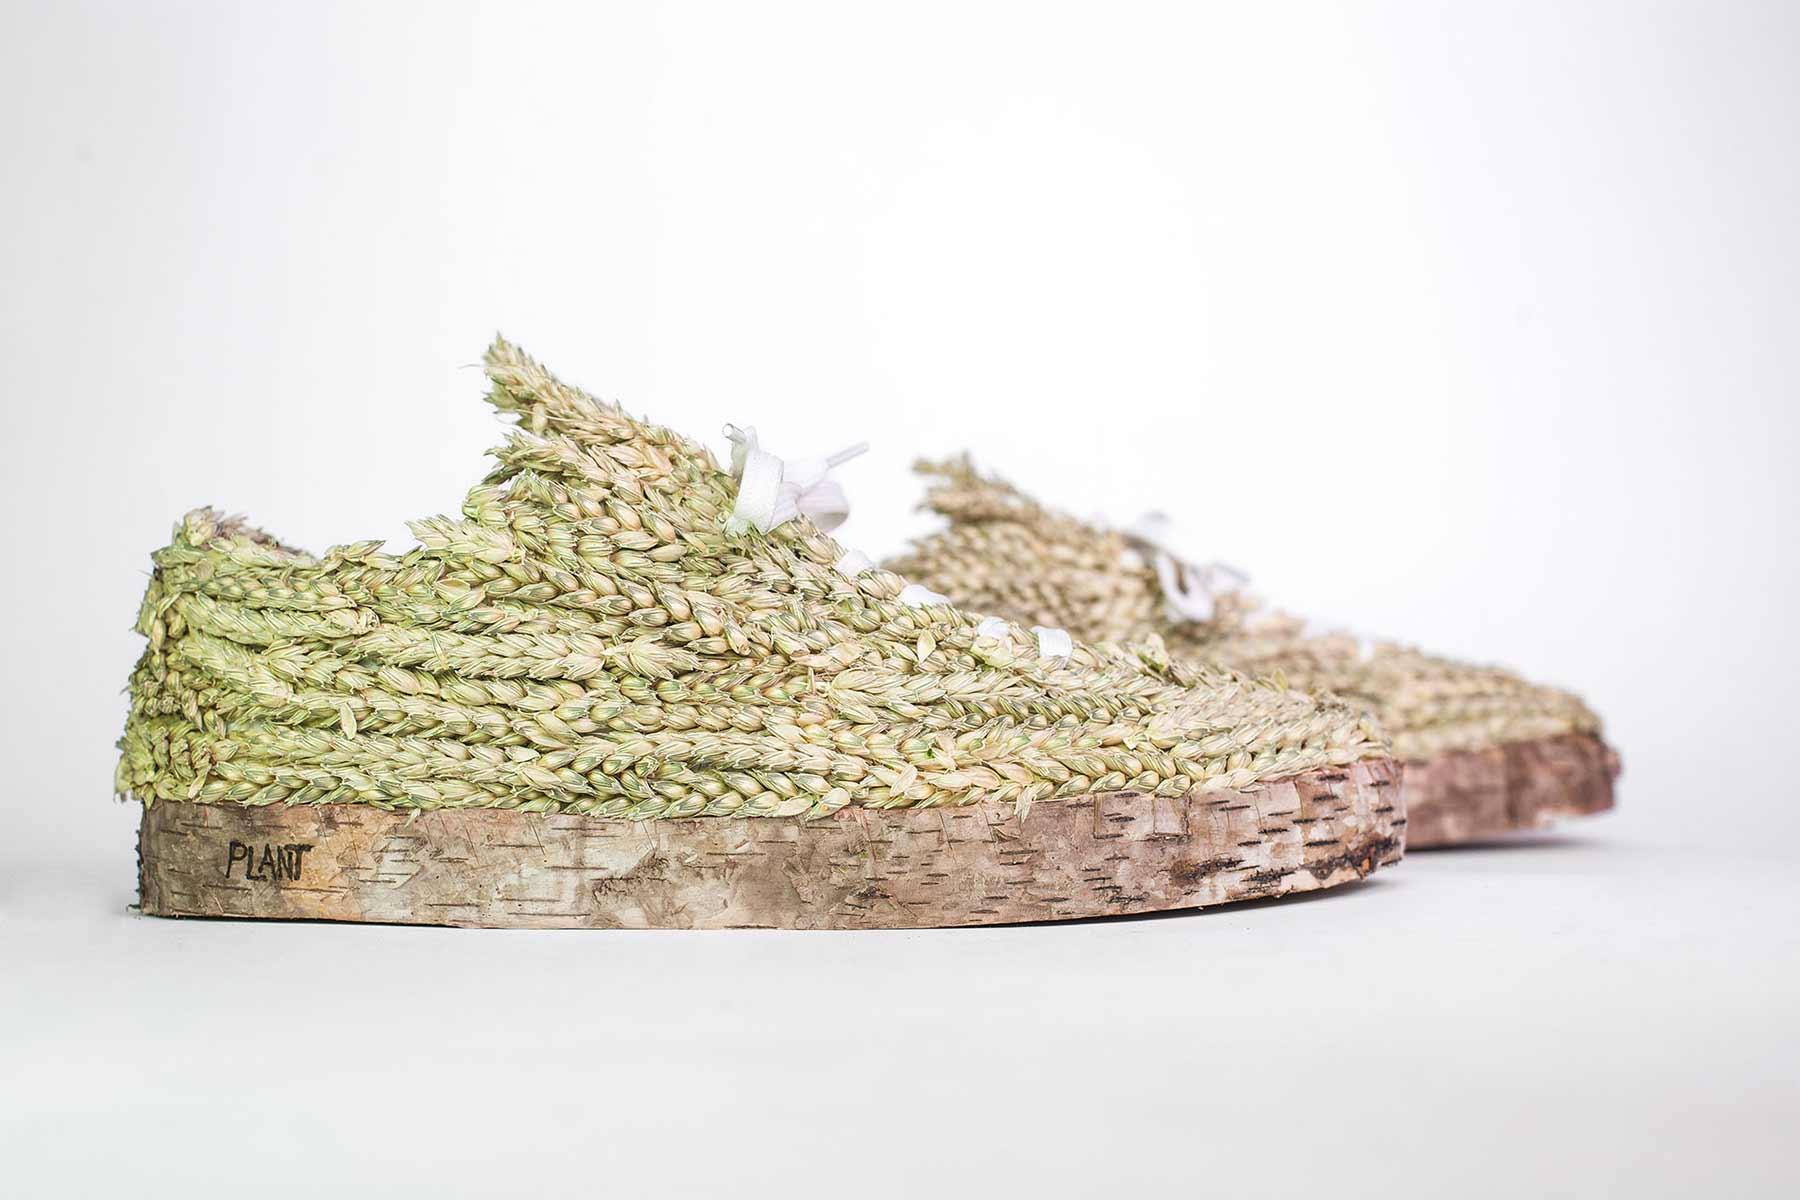 Wald- und Wiesen-Sneaker Monsieur-Plant-nature-sneaker_06